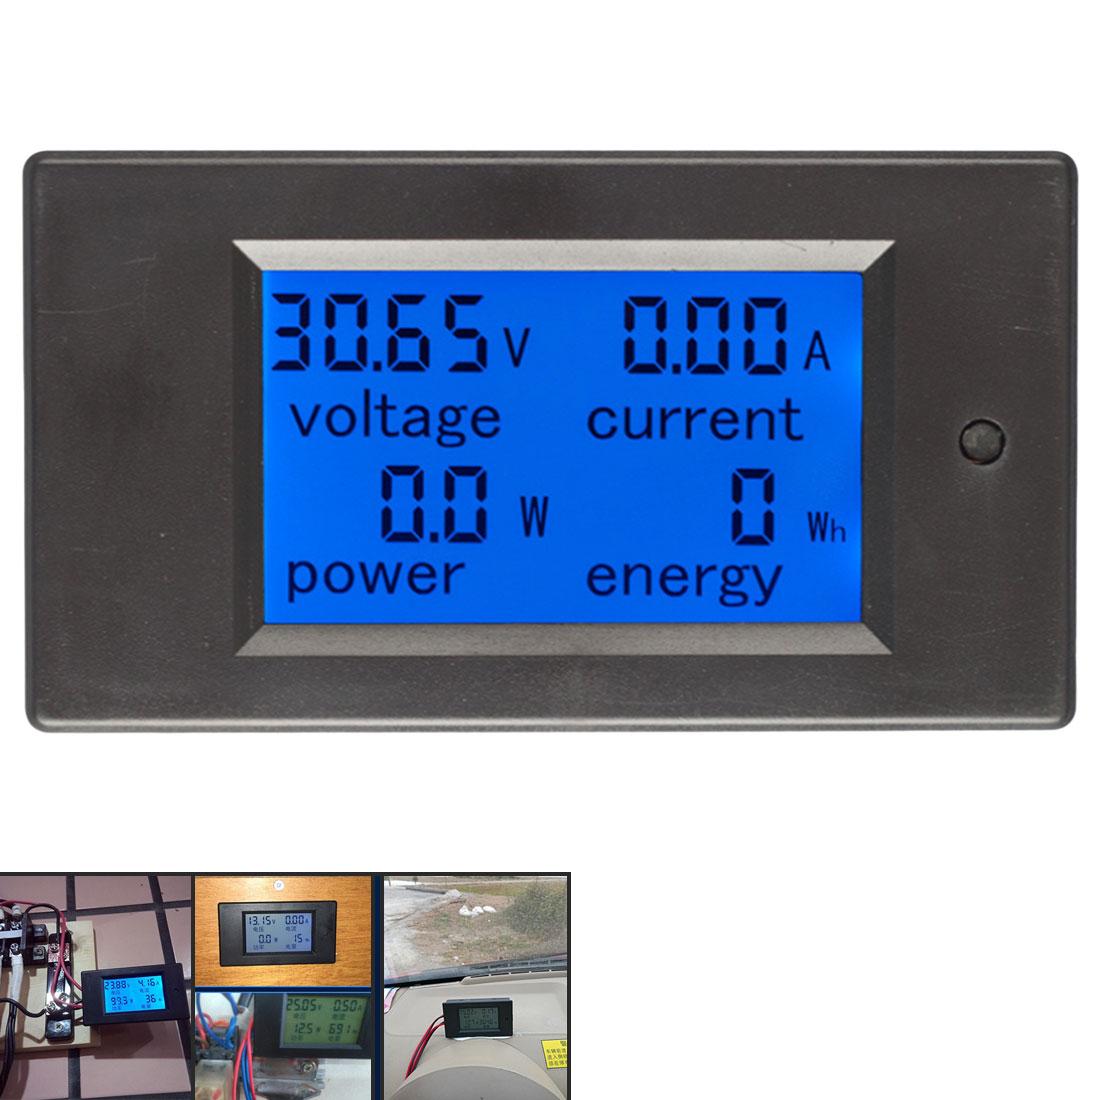 Medidor de energia de corrente digital dc 6.5-100 v 0-100a display lcd multímetro amperímetro voltímetro 100a atual shunt